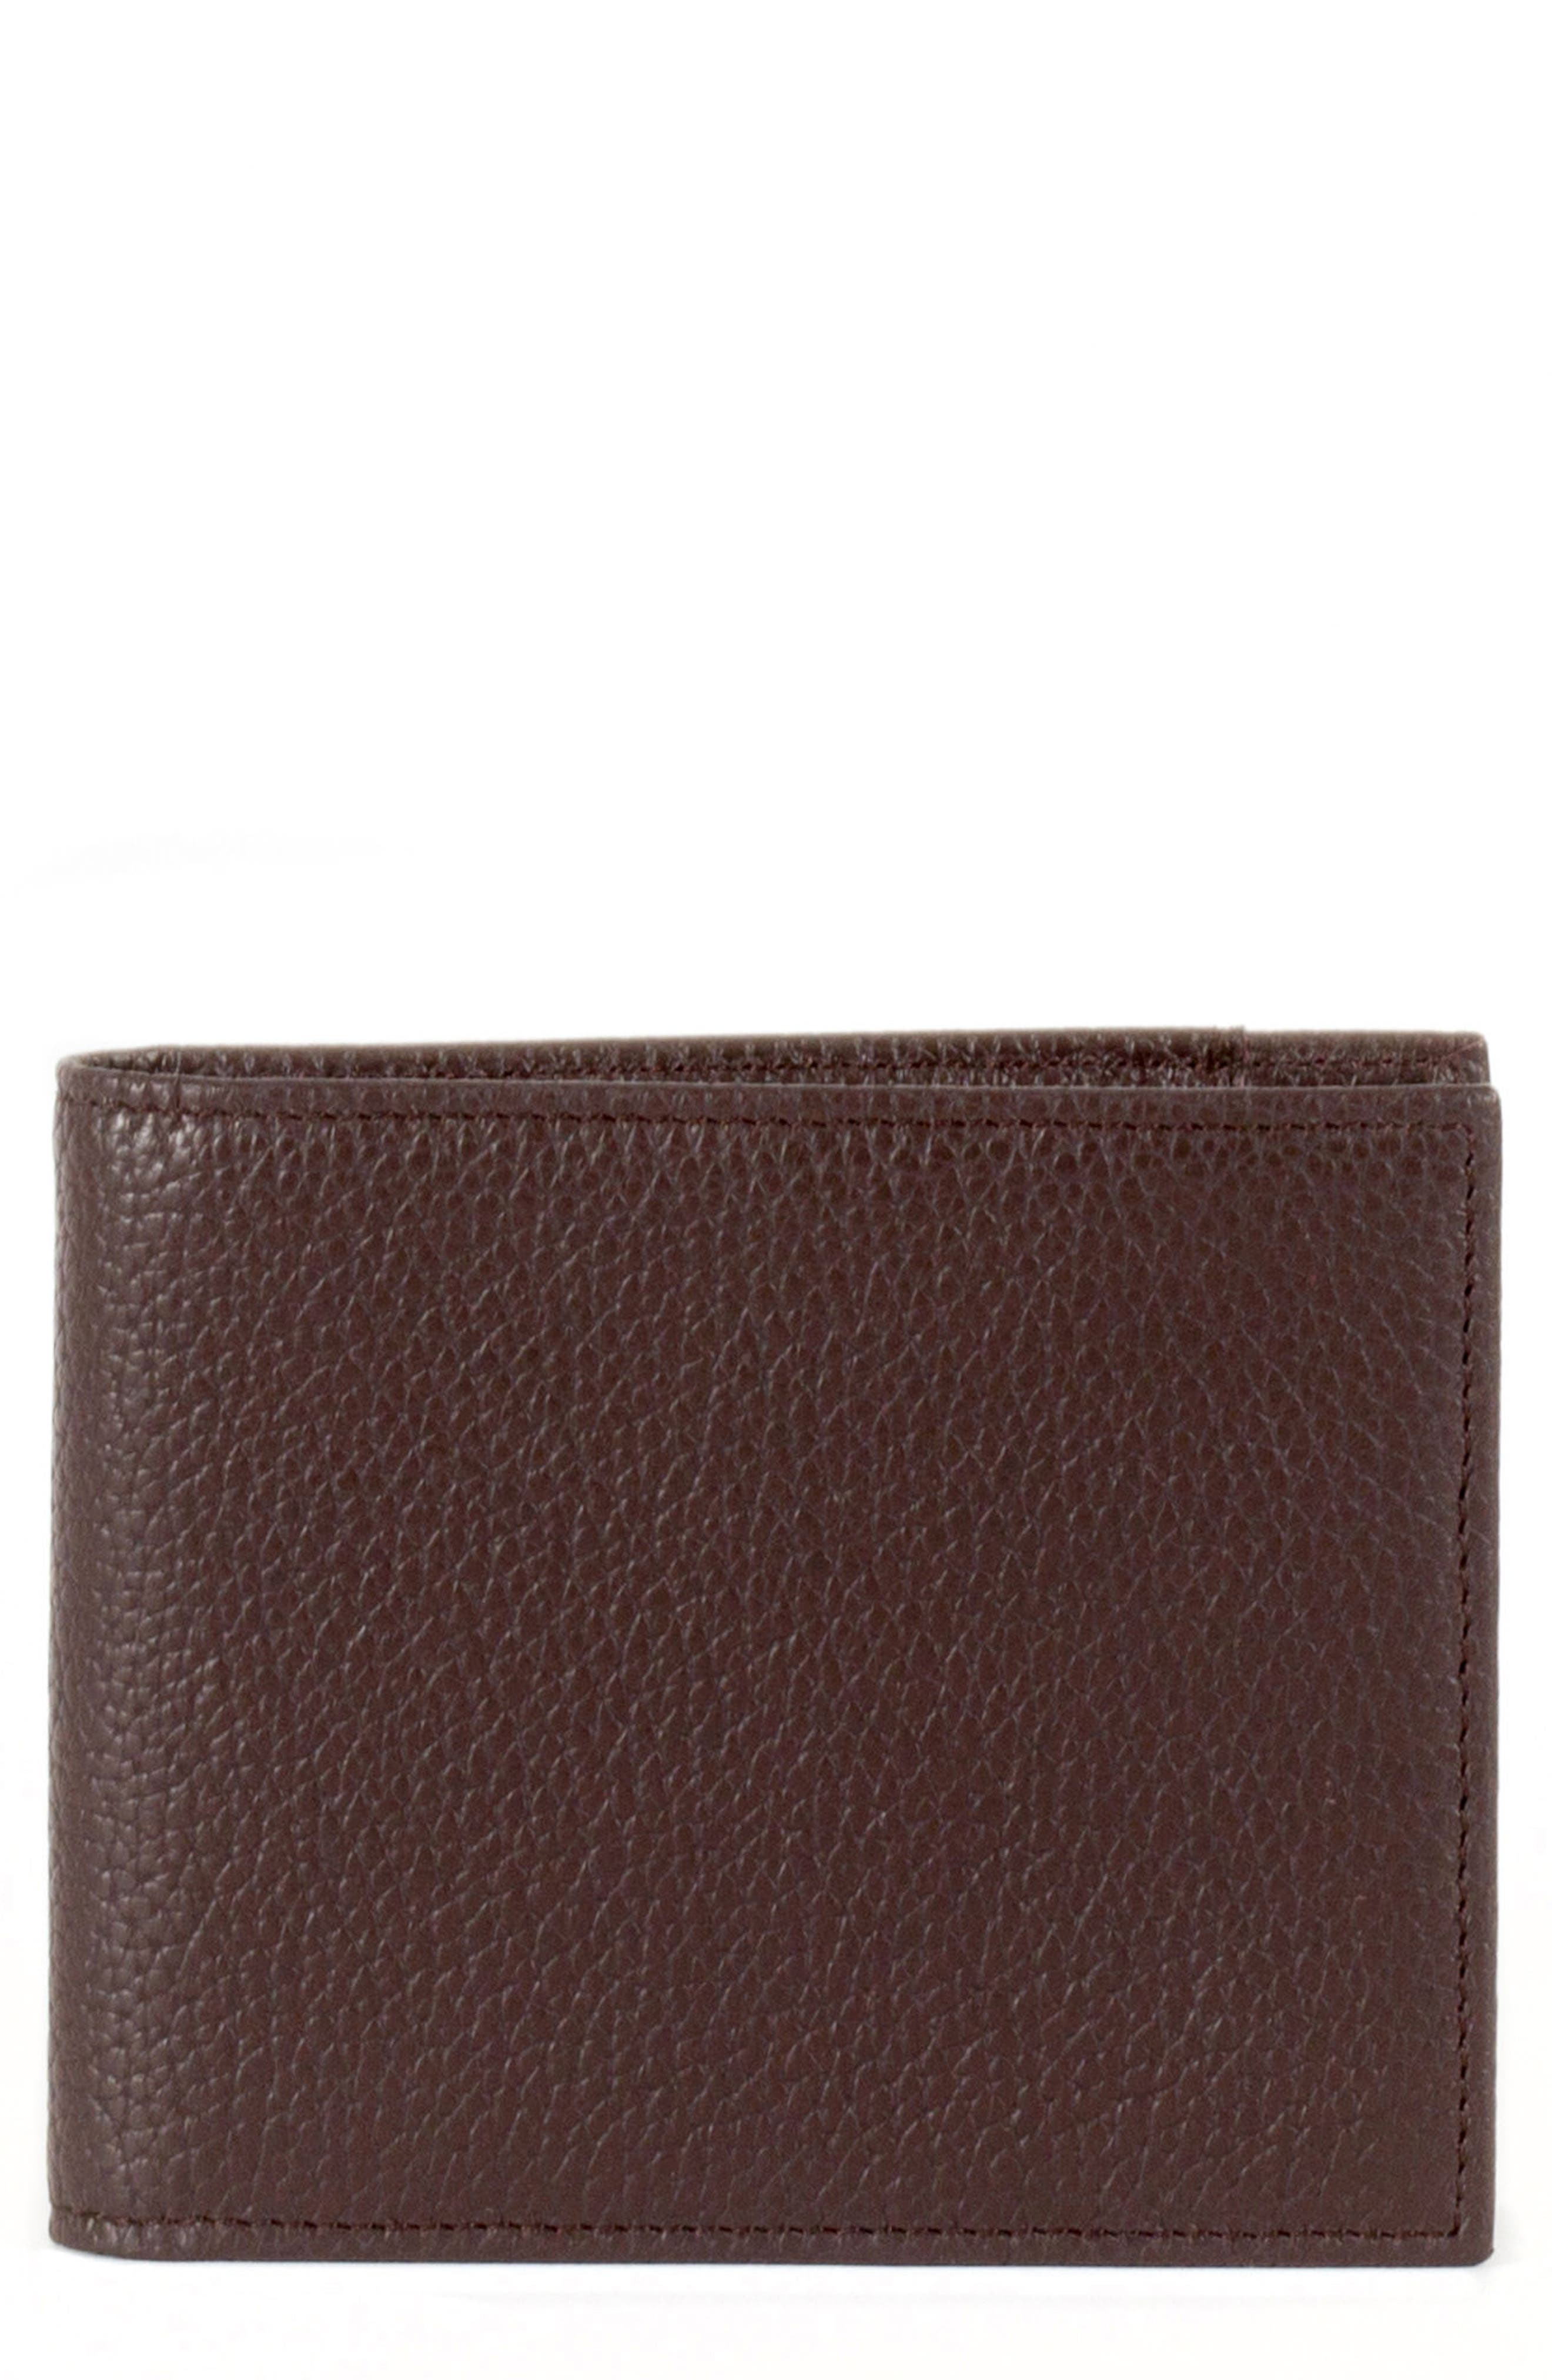 Garth Leather Bifold Wallet,                         Main,                         color, Brown/ Tan/ Purple